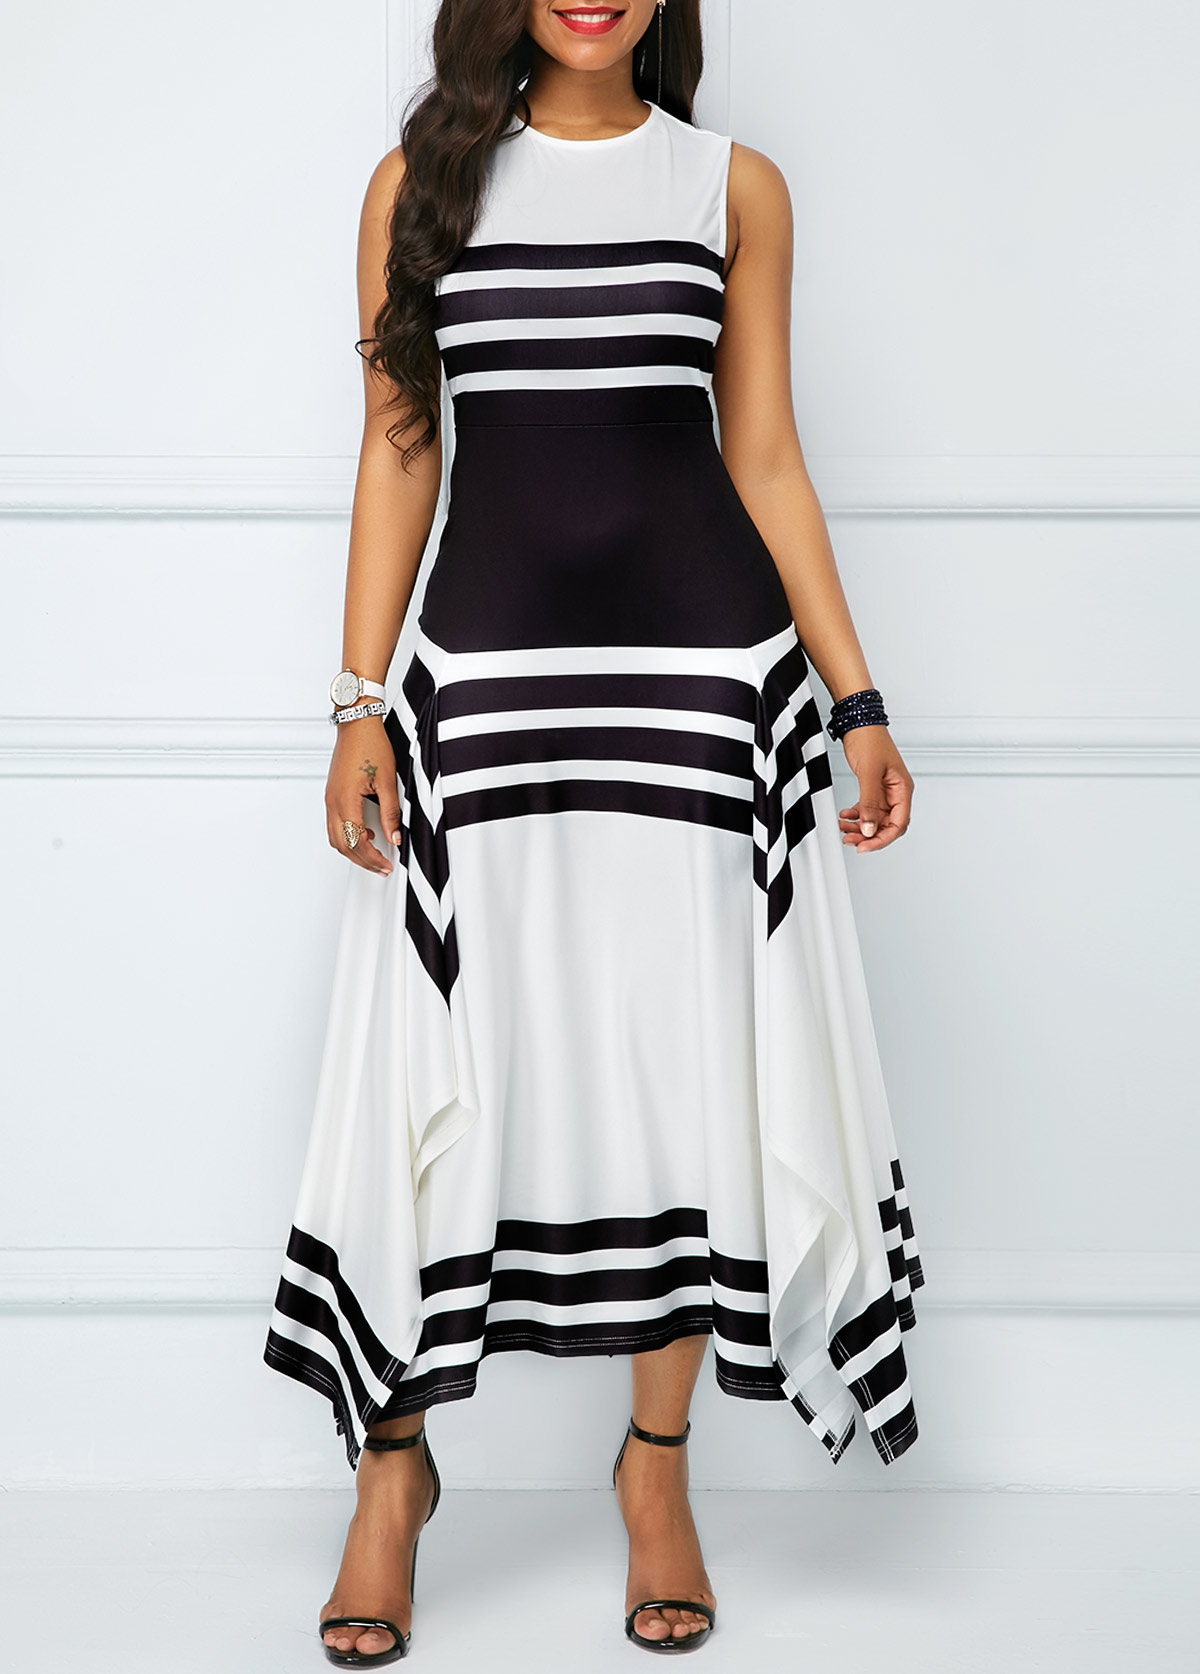 Fashion Dresses Style: Asymmetric Hem Stripe Print Sleeveless Midi Dress